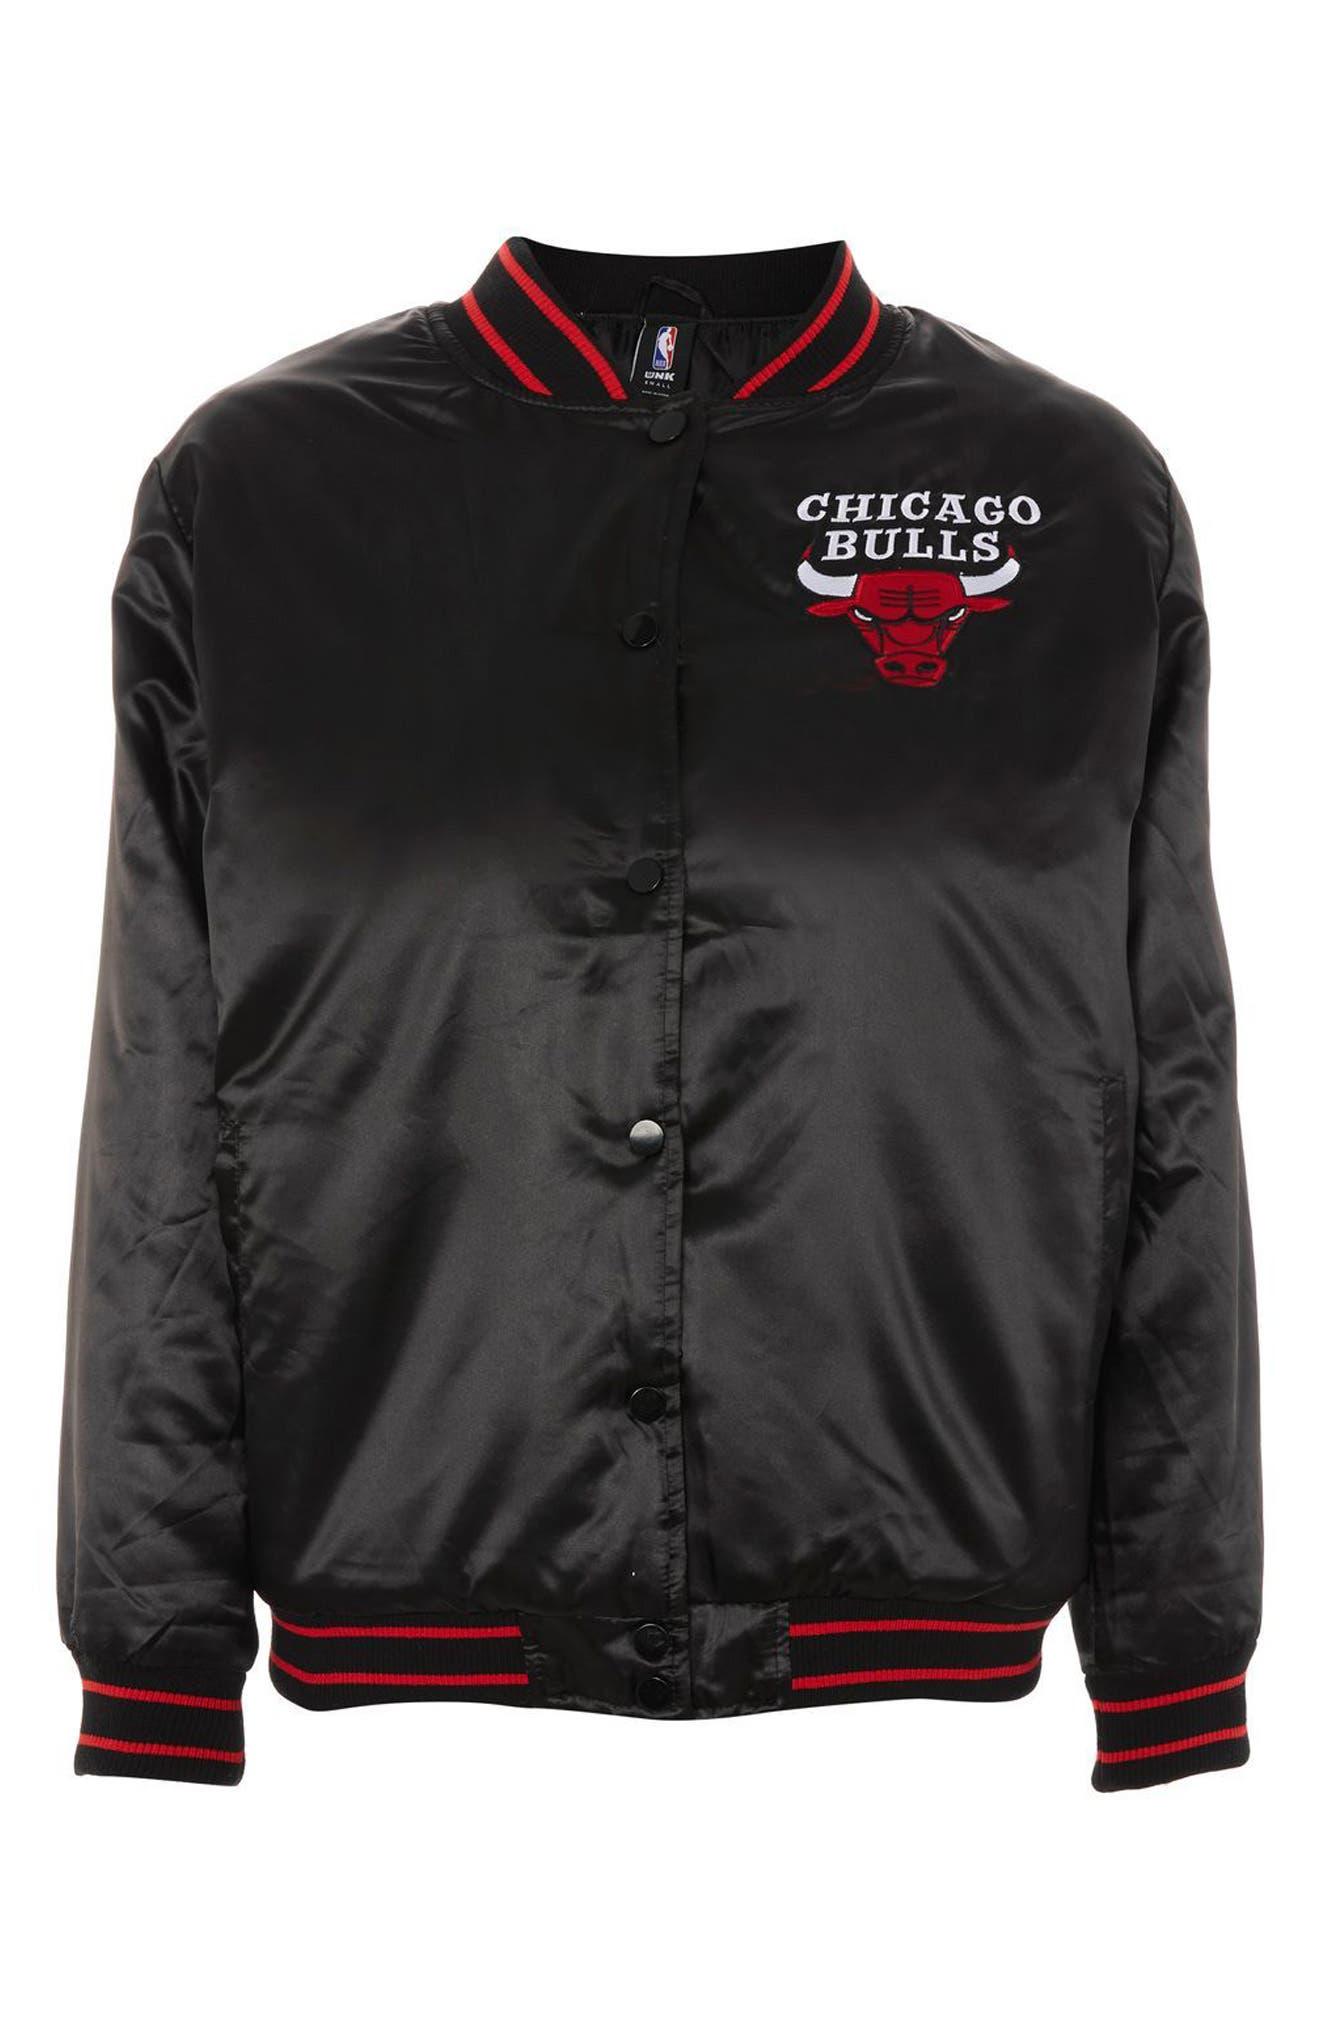 x UNK Chicago Bulls Bomber Jacket,                         Main,                         color, Black Multi